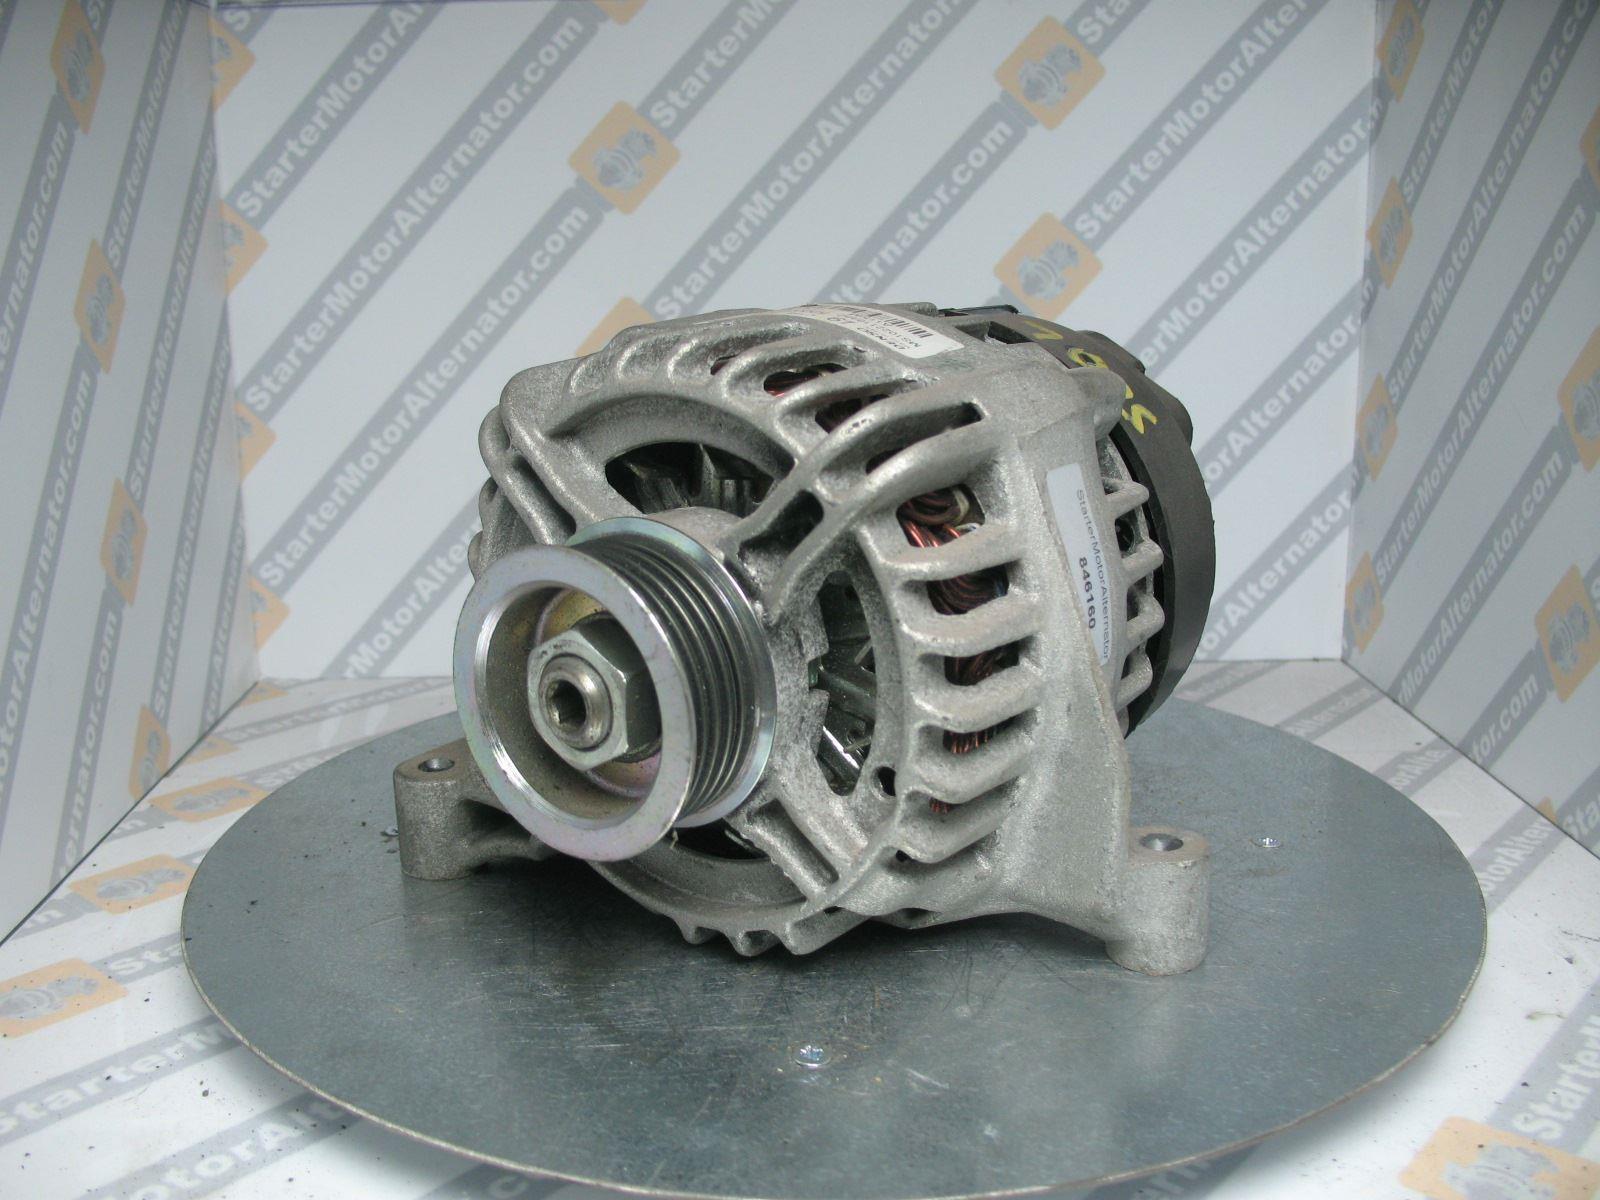 XIG1369 Alternator For BMW / Fiat